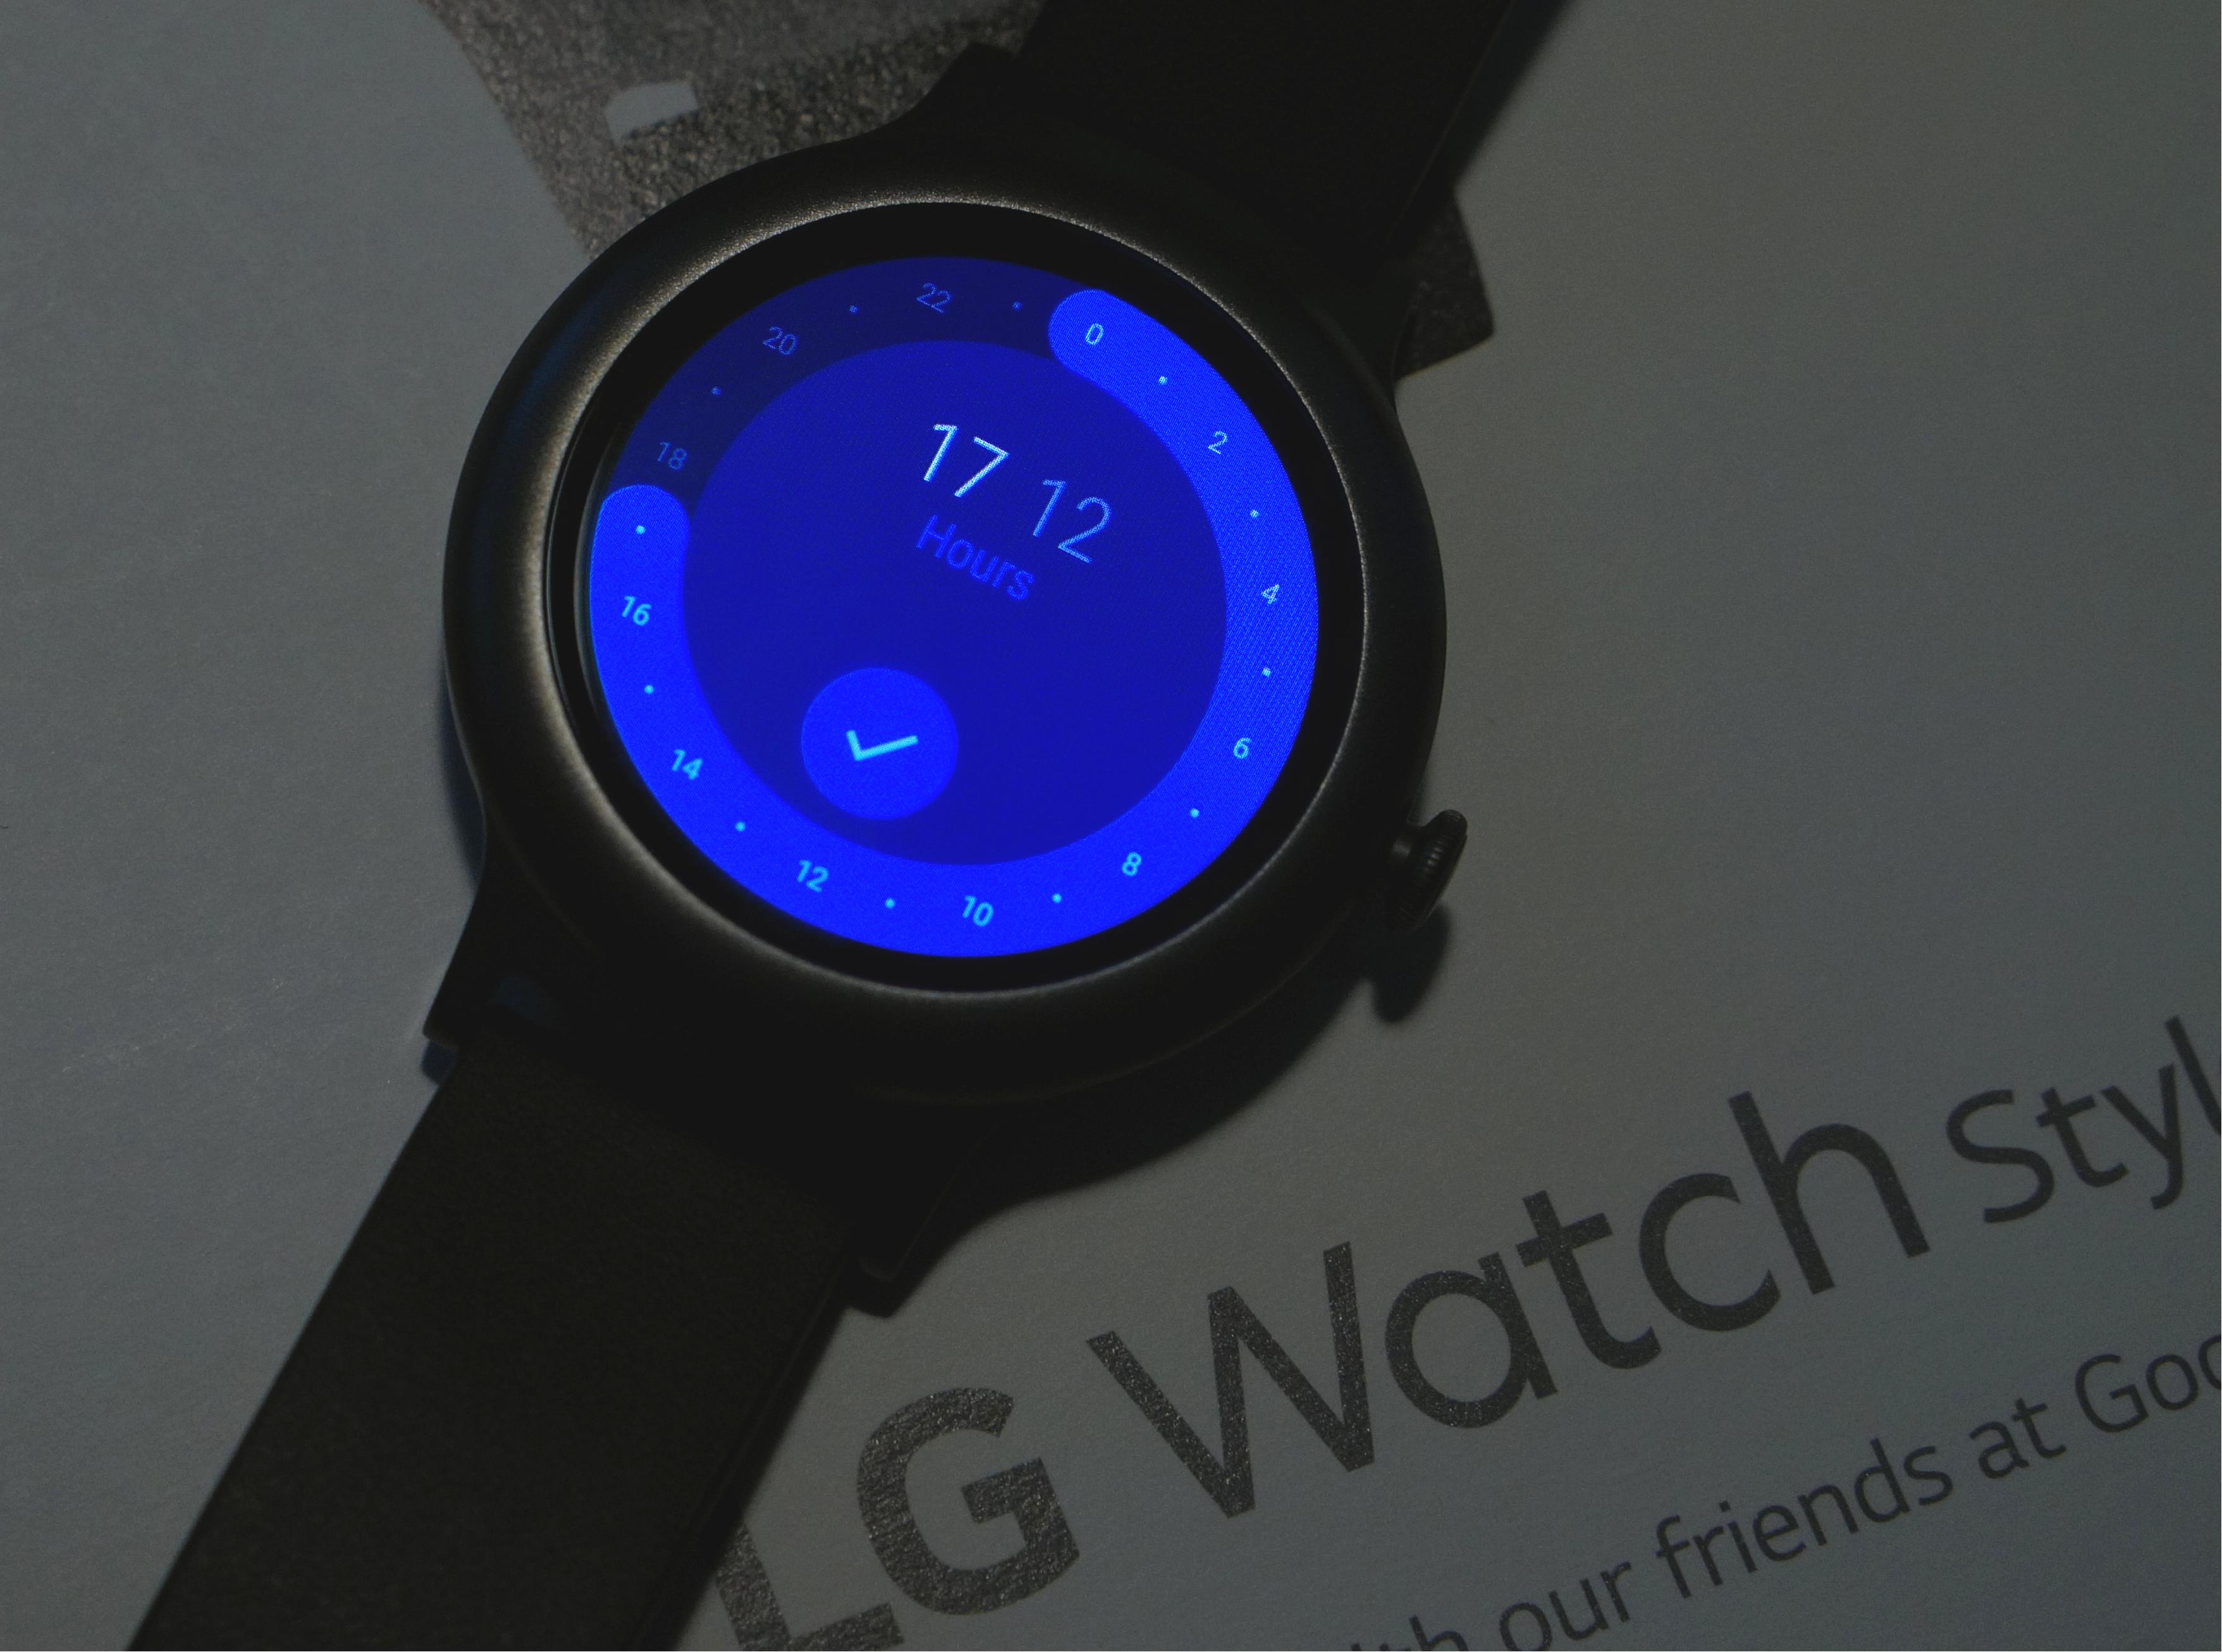 lg_watch_alarm